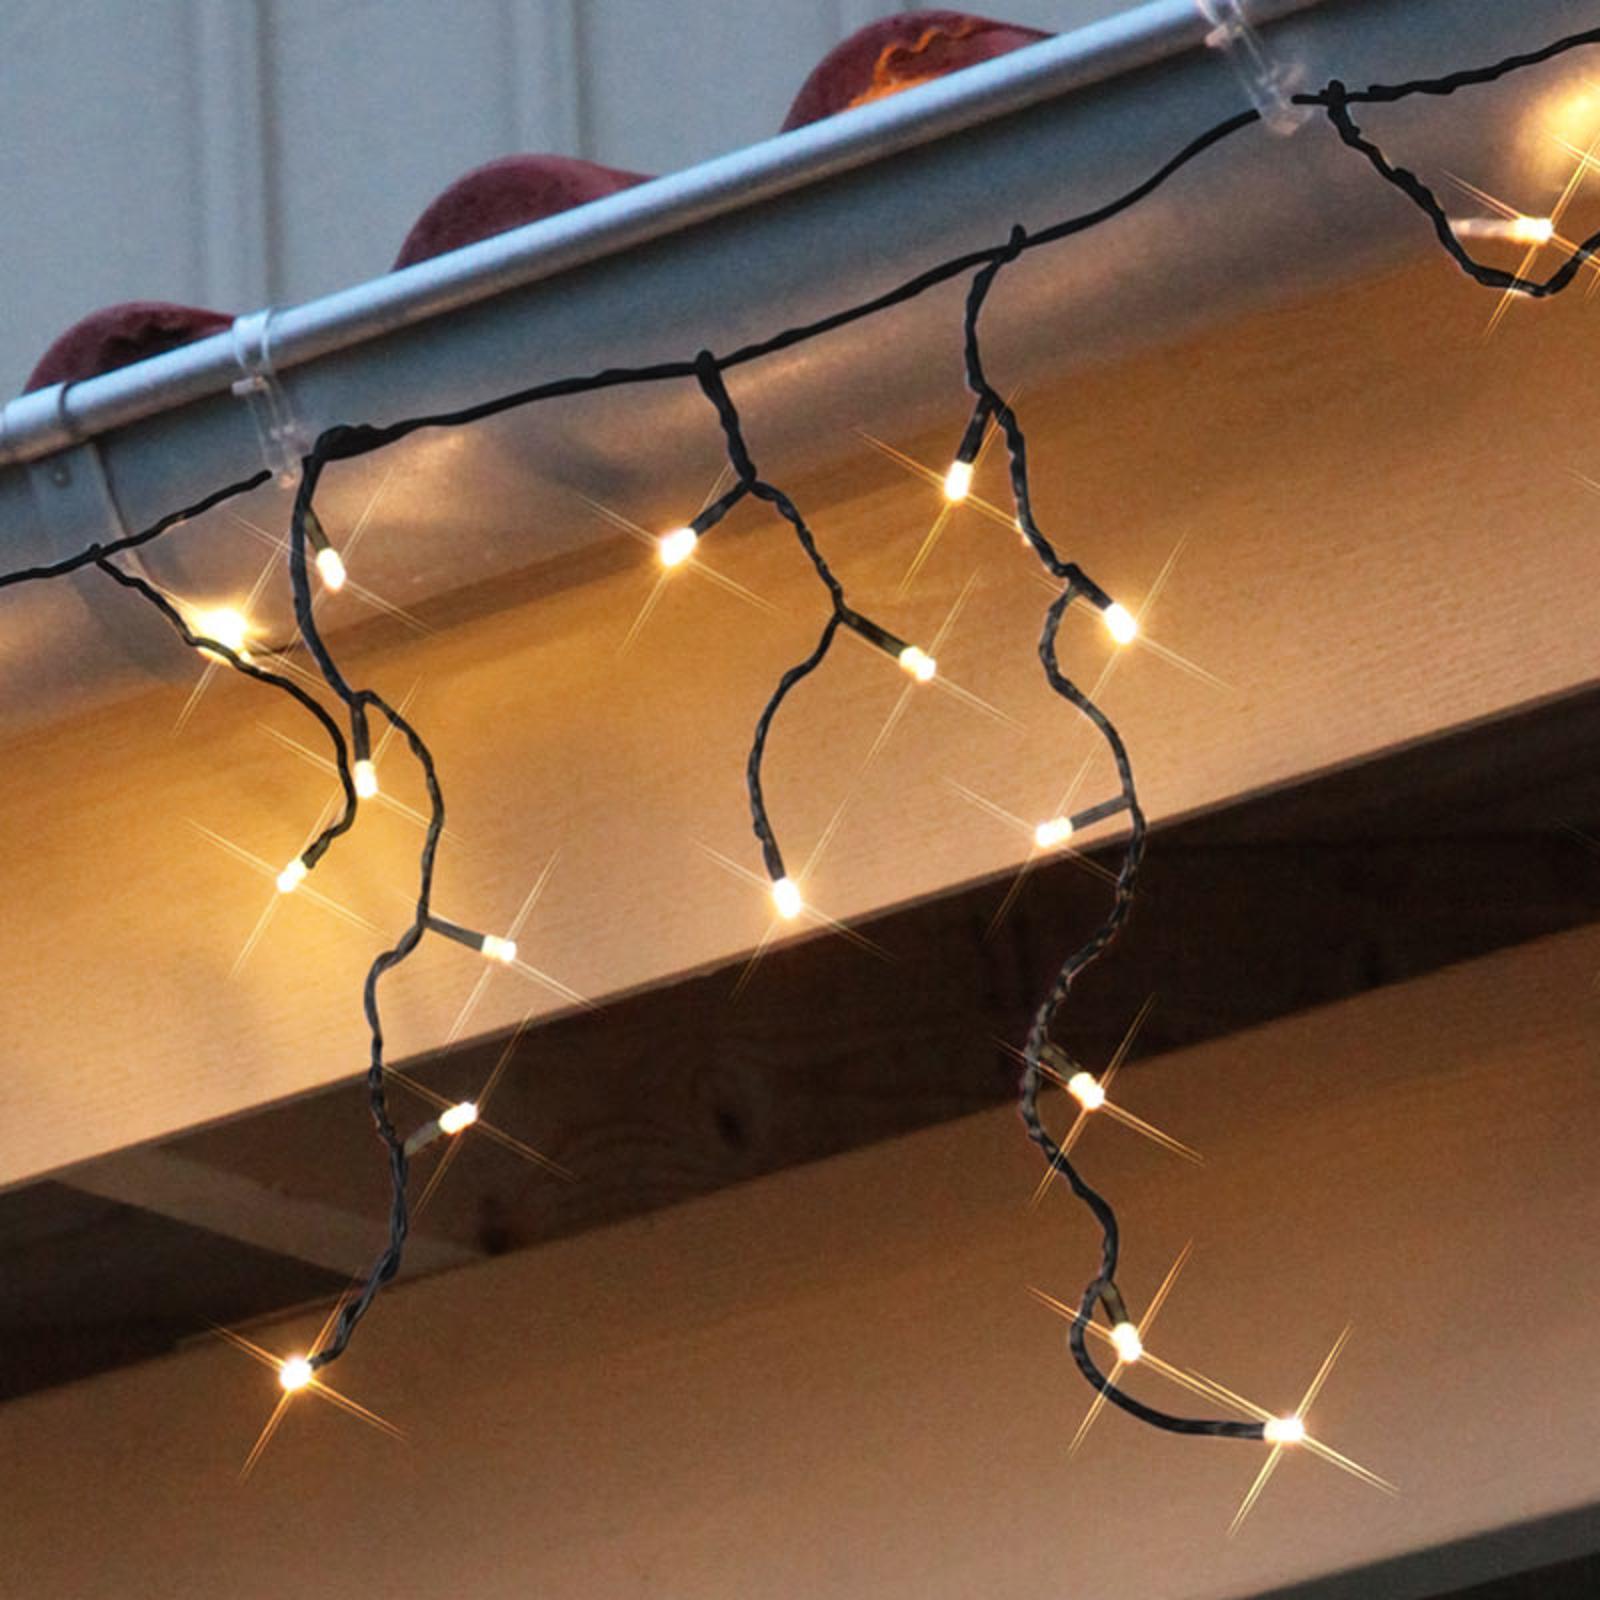 Icicle LED 144 lampor, 4x04 4m   Lamp24.se